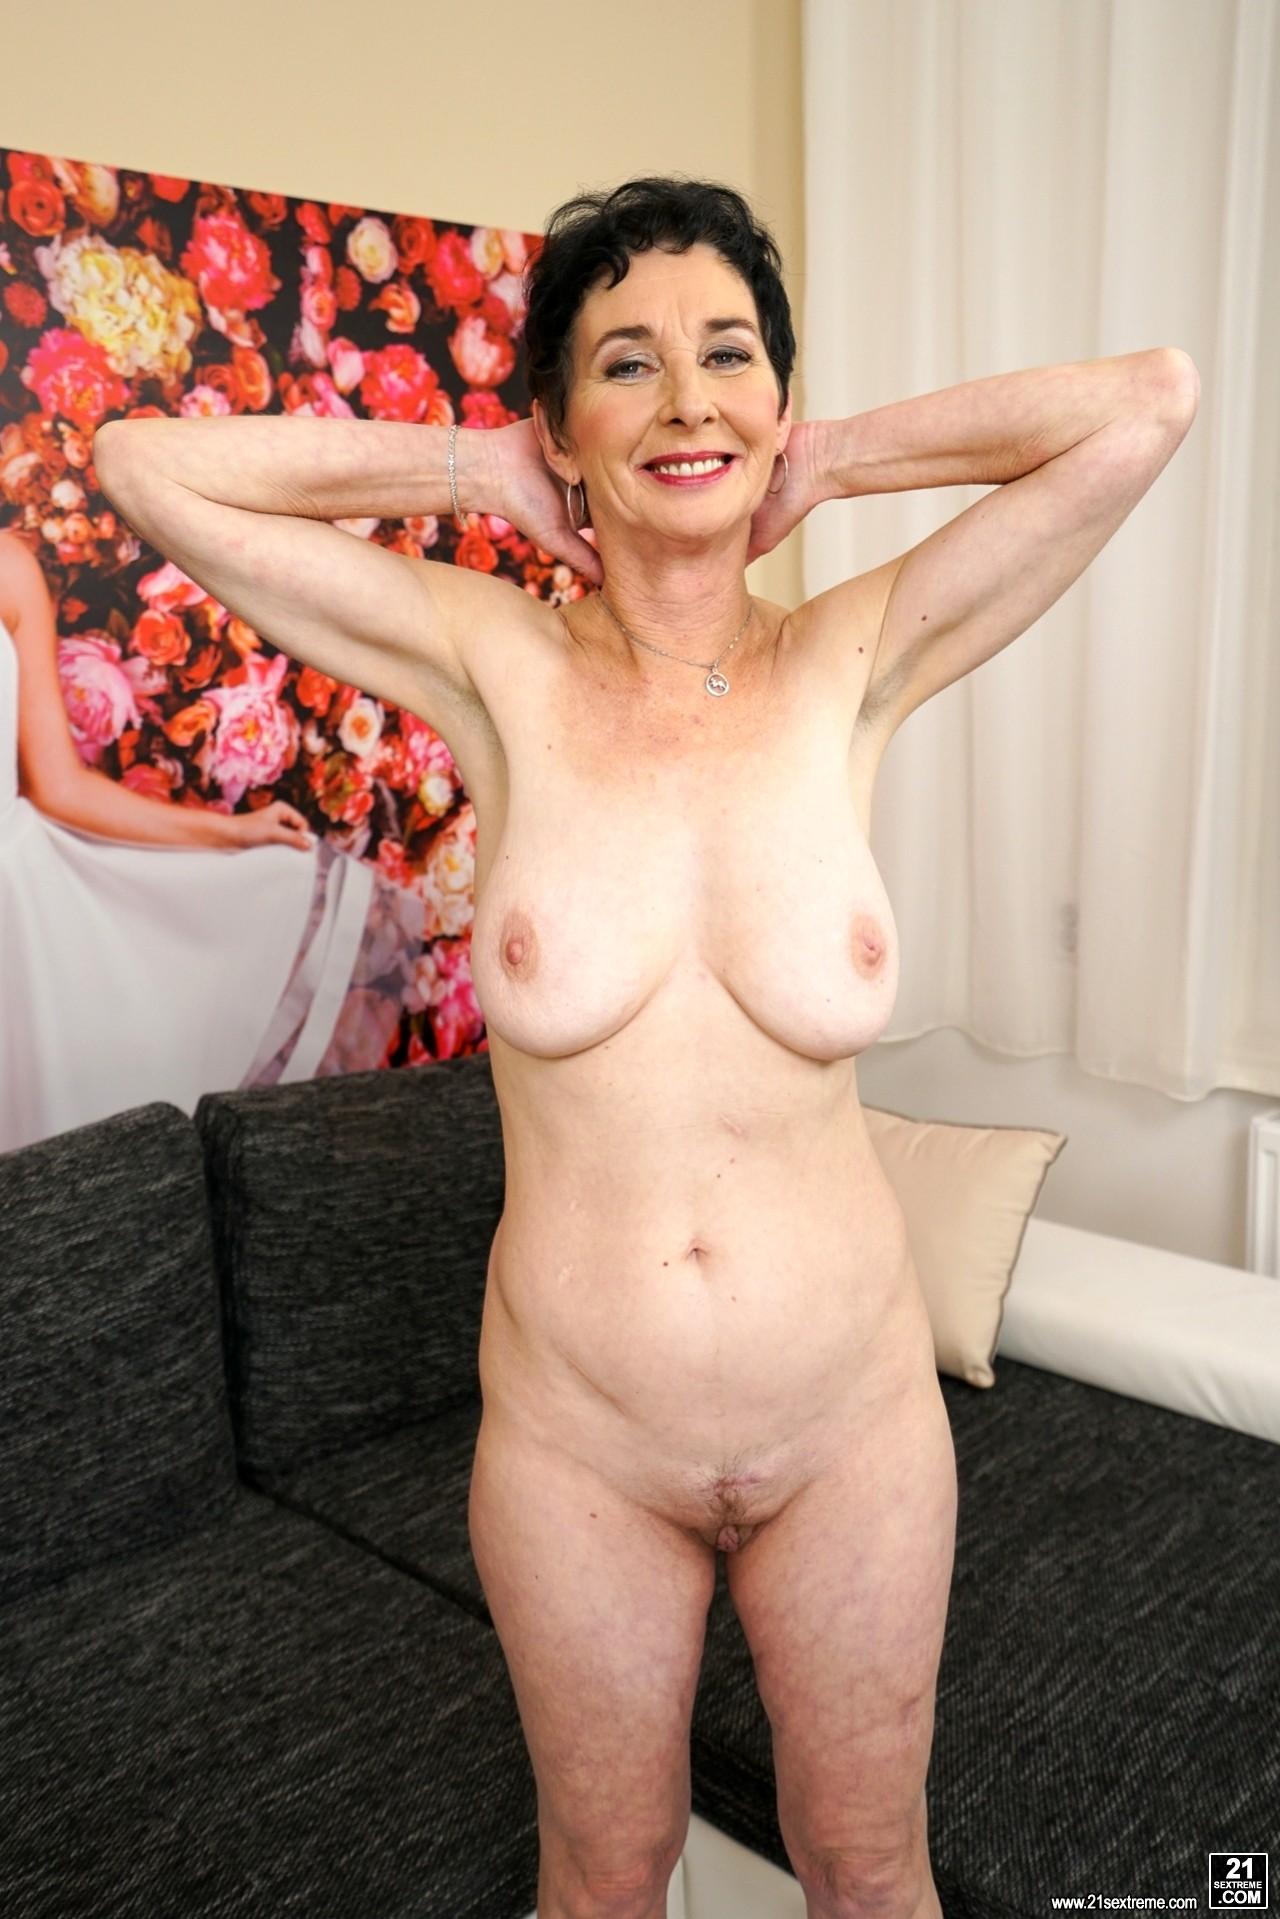 21 Sextury Pixie My Granny Livestream Sex Hd Pics-2863